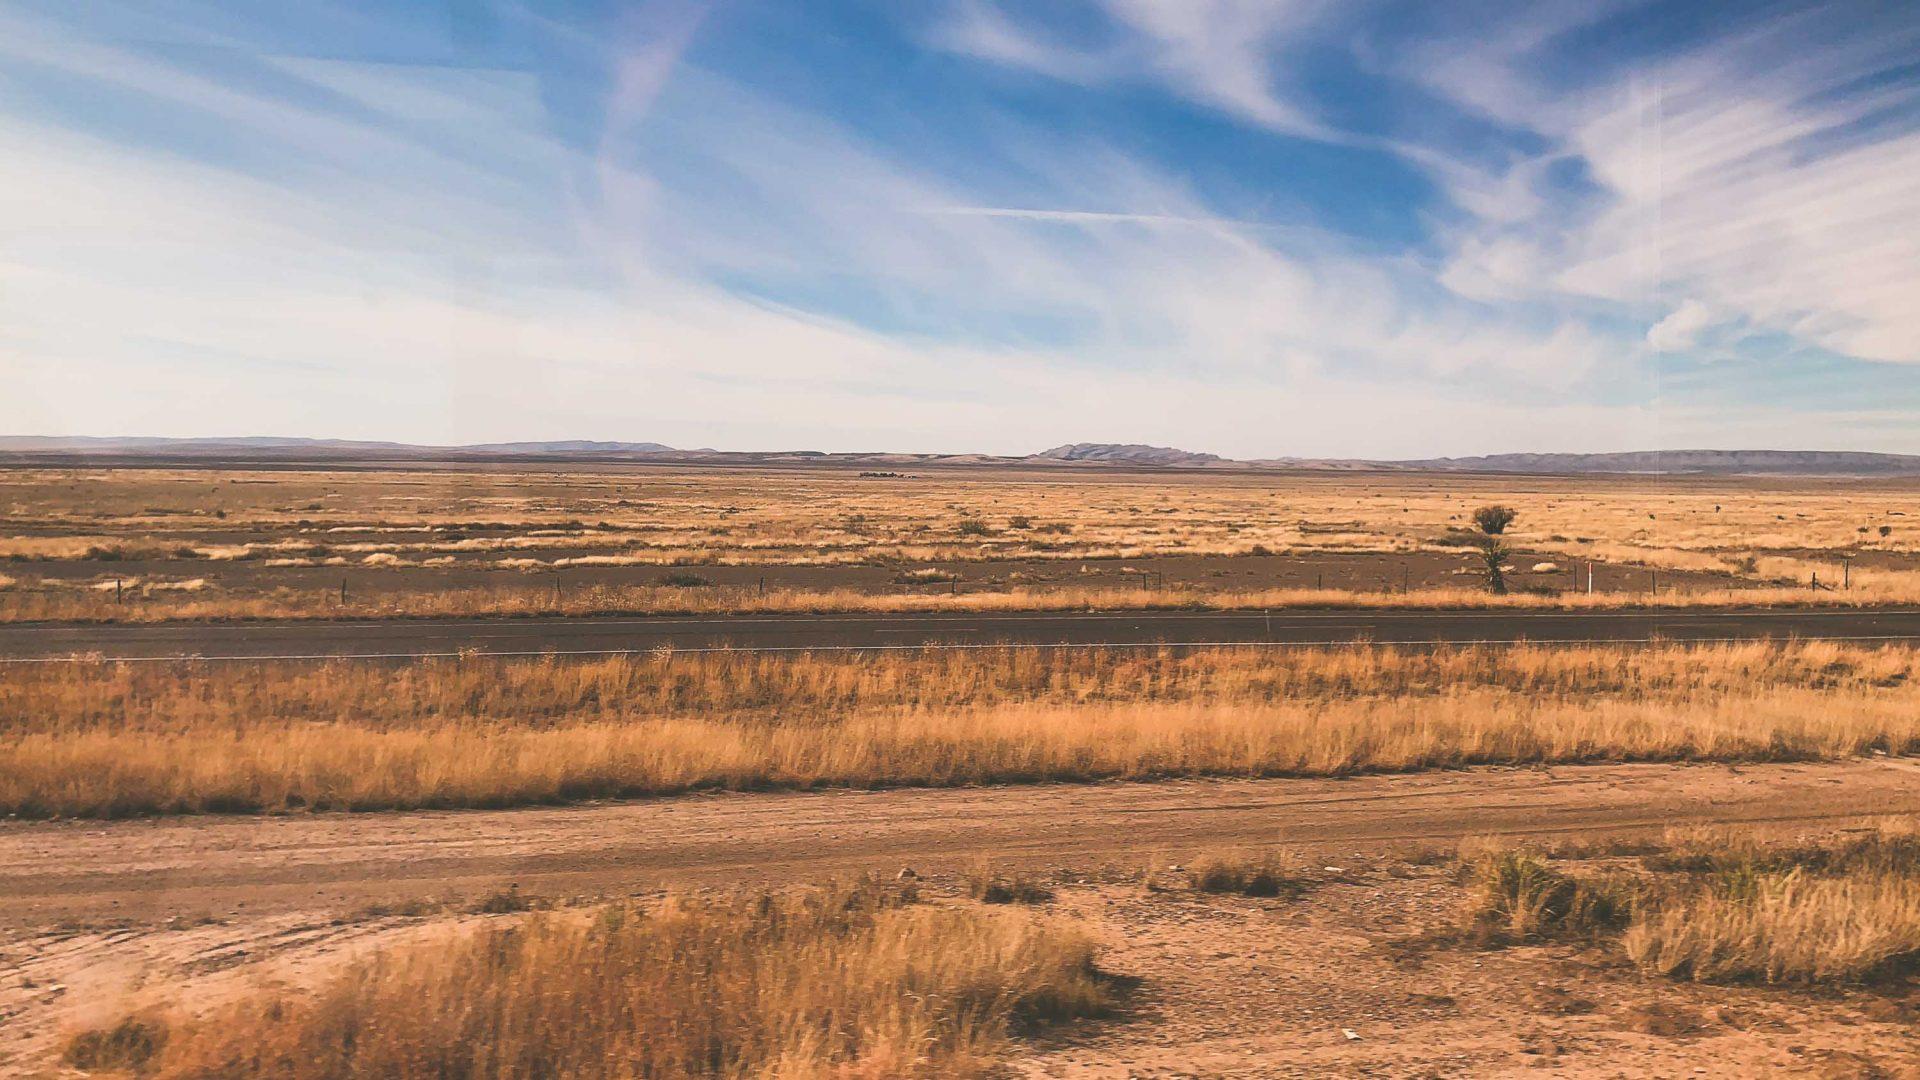 Views of New Mexico through the train window.